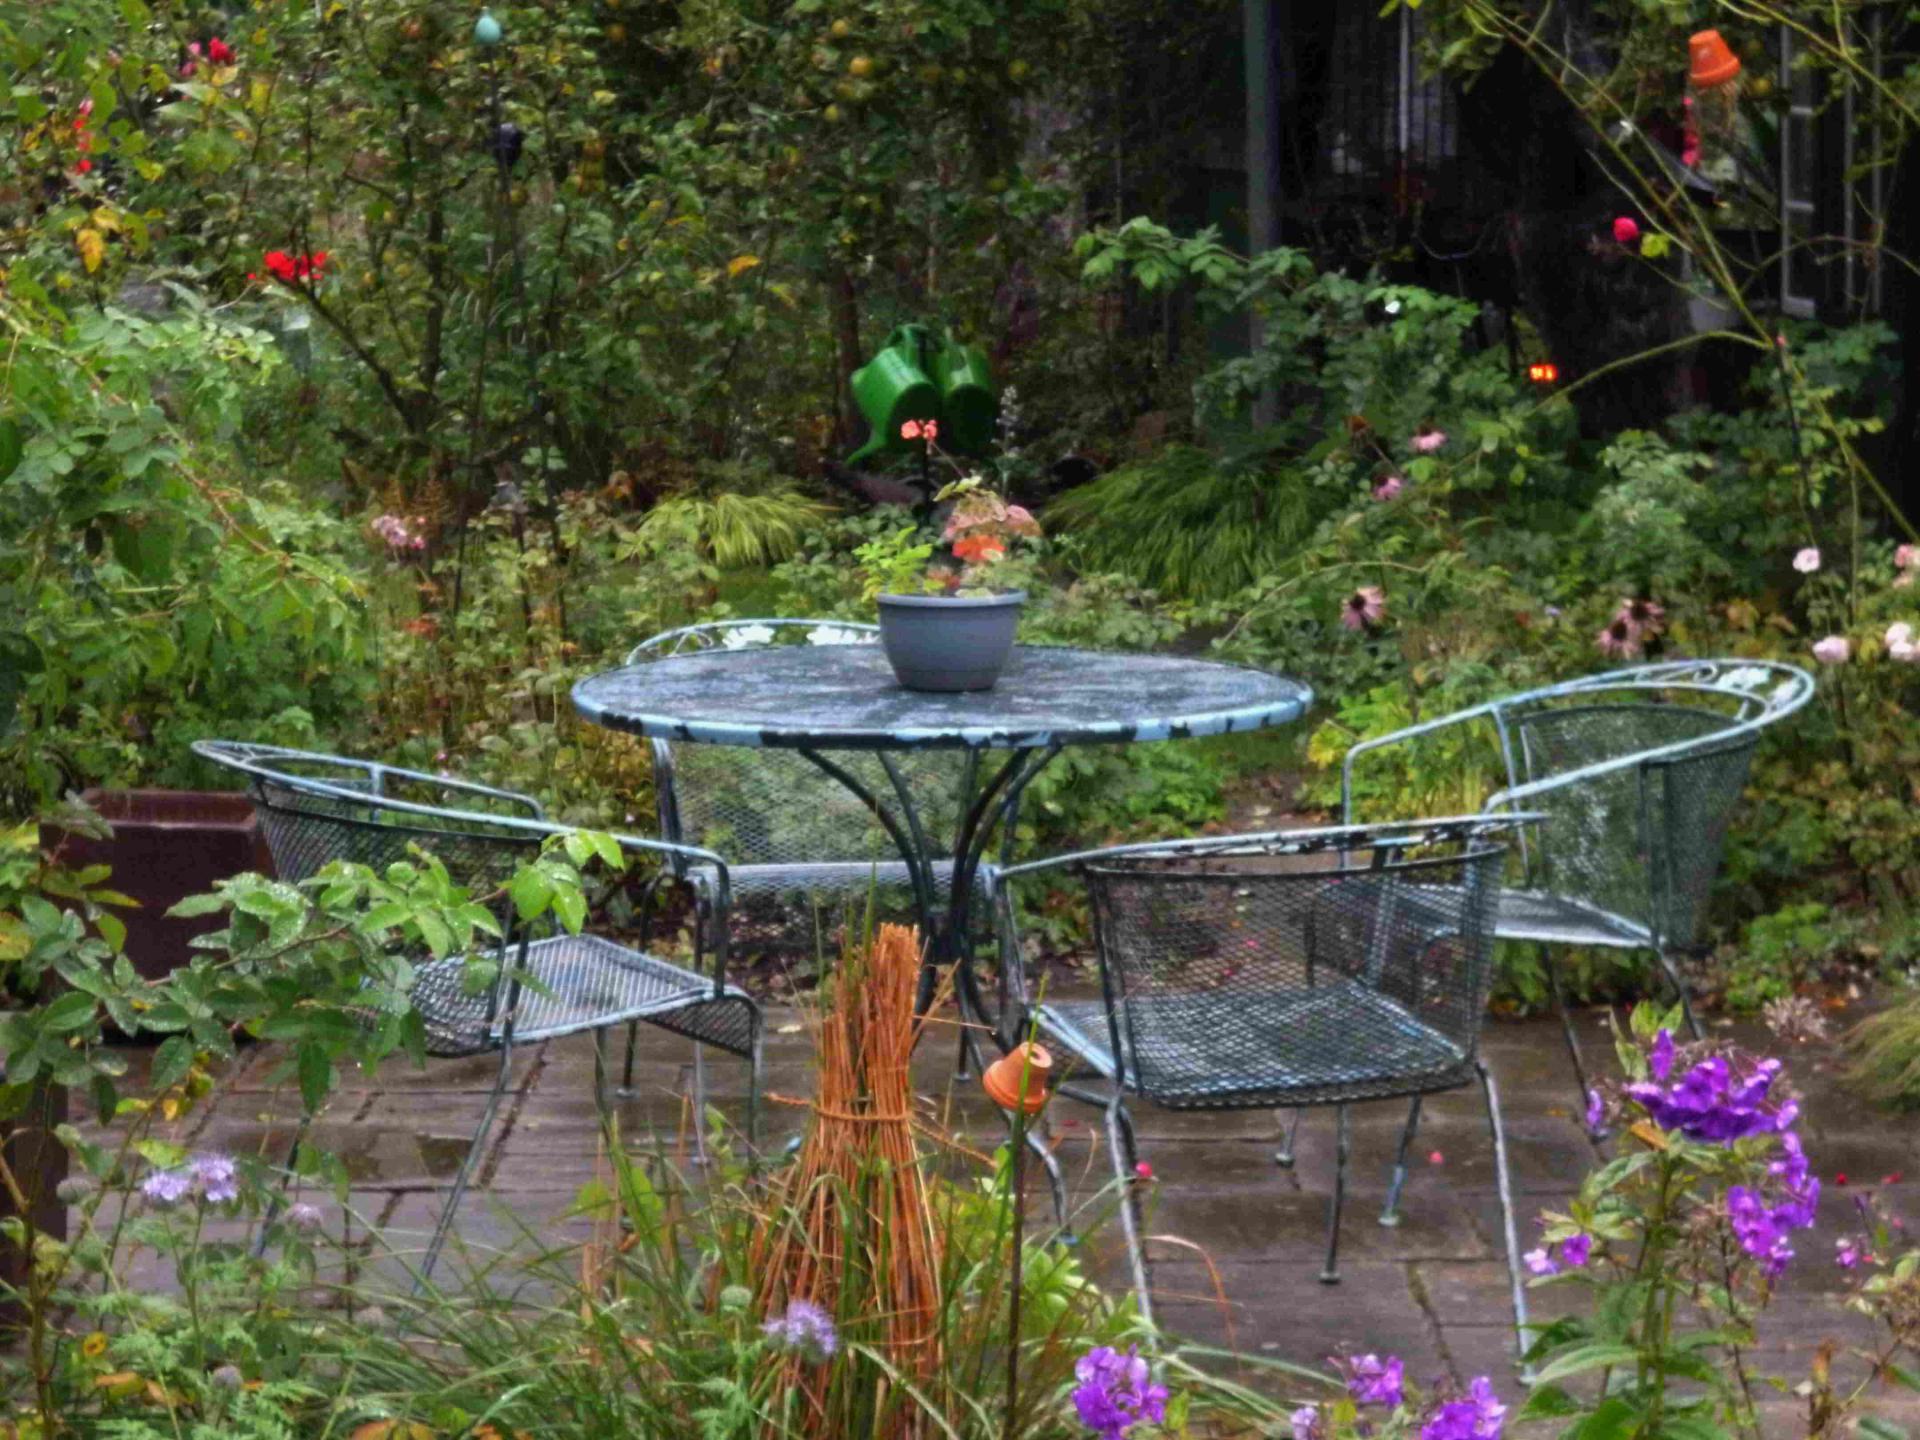 Offene Gartenpfporte 26-09-2020 Bild 11